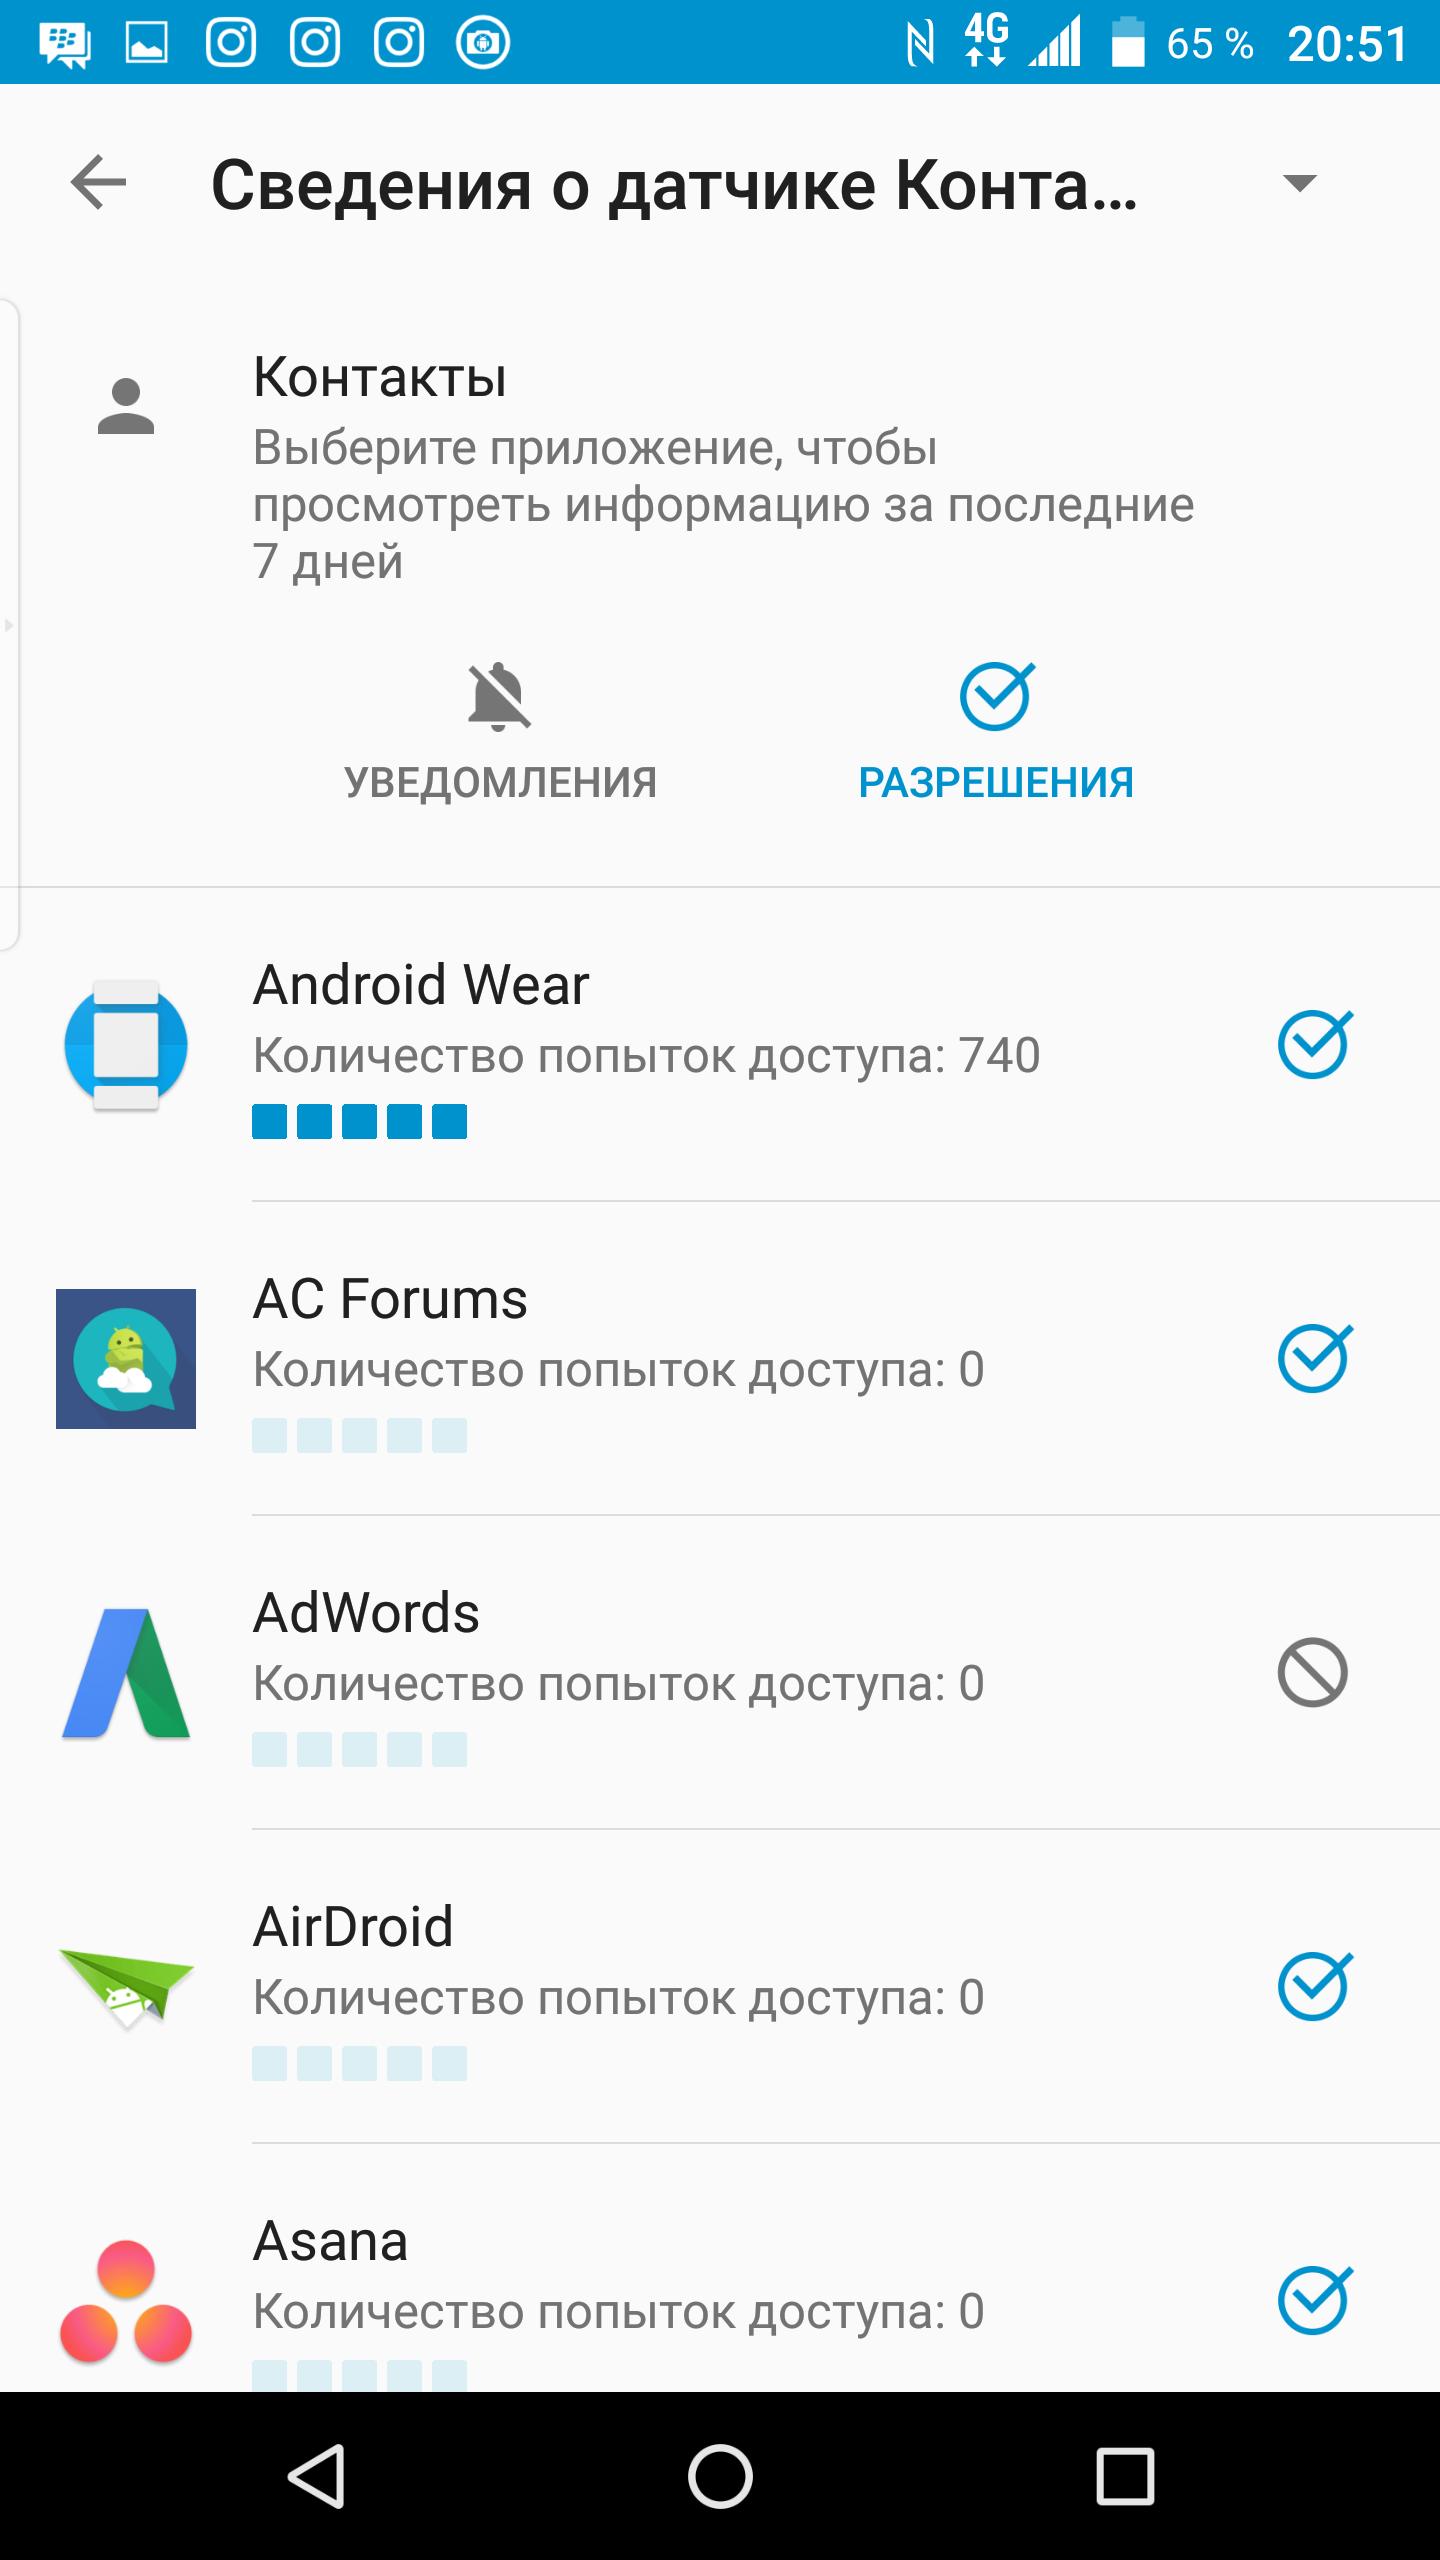 screenshot_20161108-205150